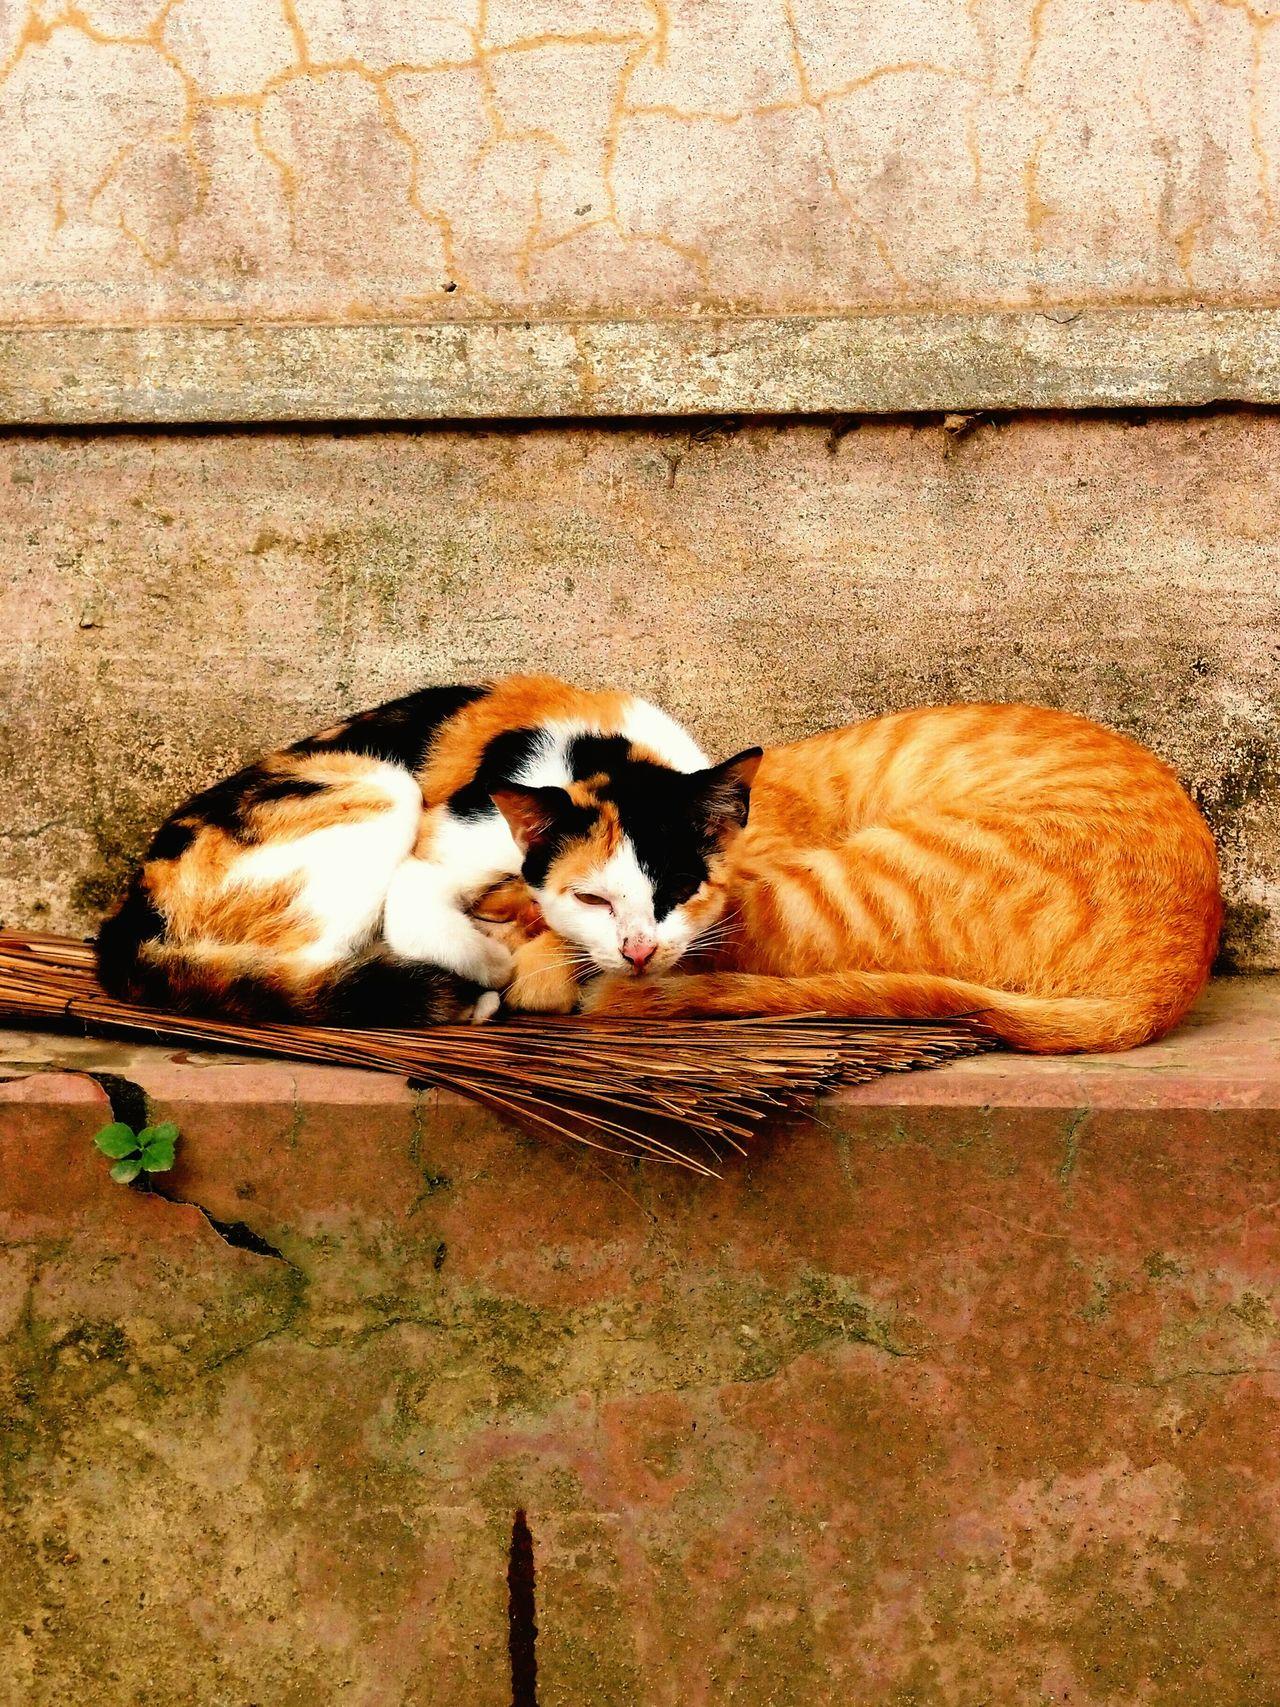 Cats Sleeping Time Cute Cats Vietnam Viet Nam Hoi An Homeless Cats Homeless Or Just Chillin' Just Chillin'